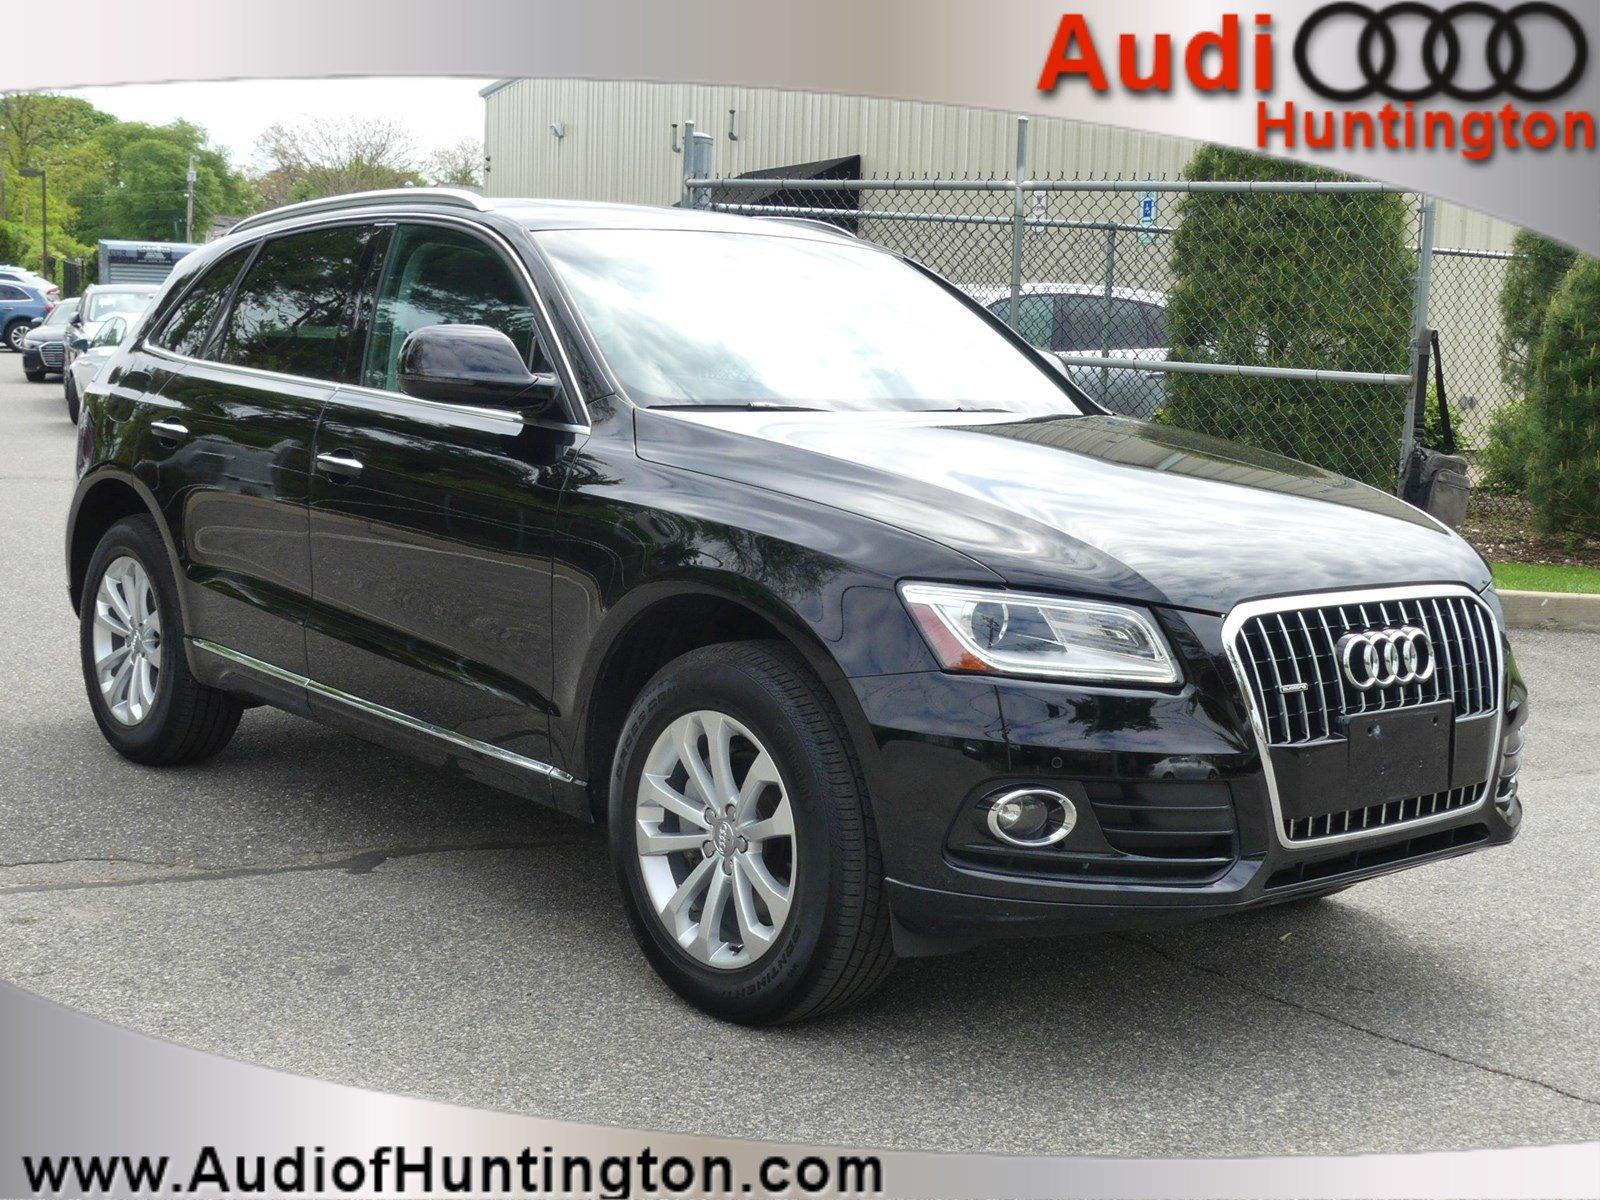 2016 Audi Q5 >> Used 2016 Audi Q5 Premium Plus For Sale In Huntington Station Ny